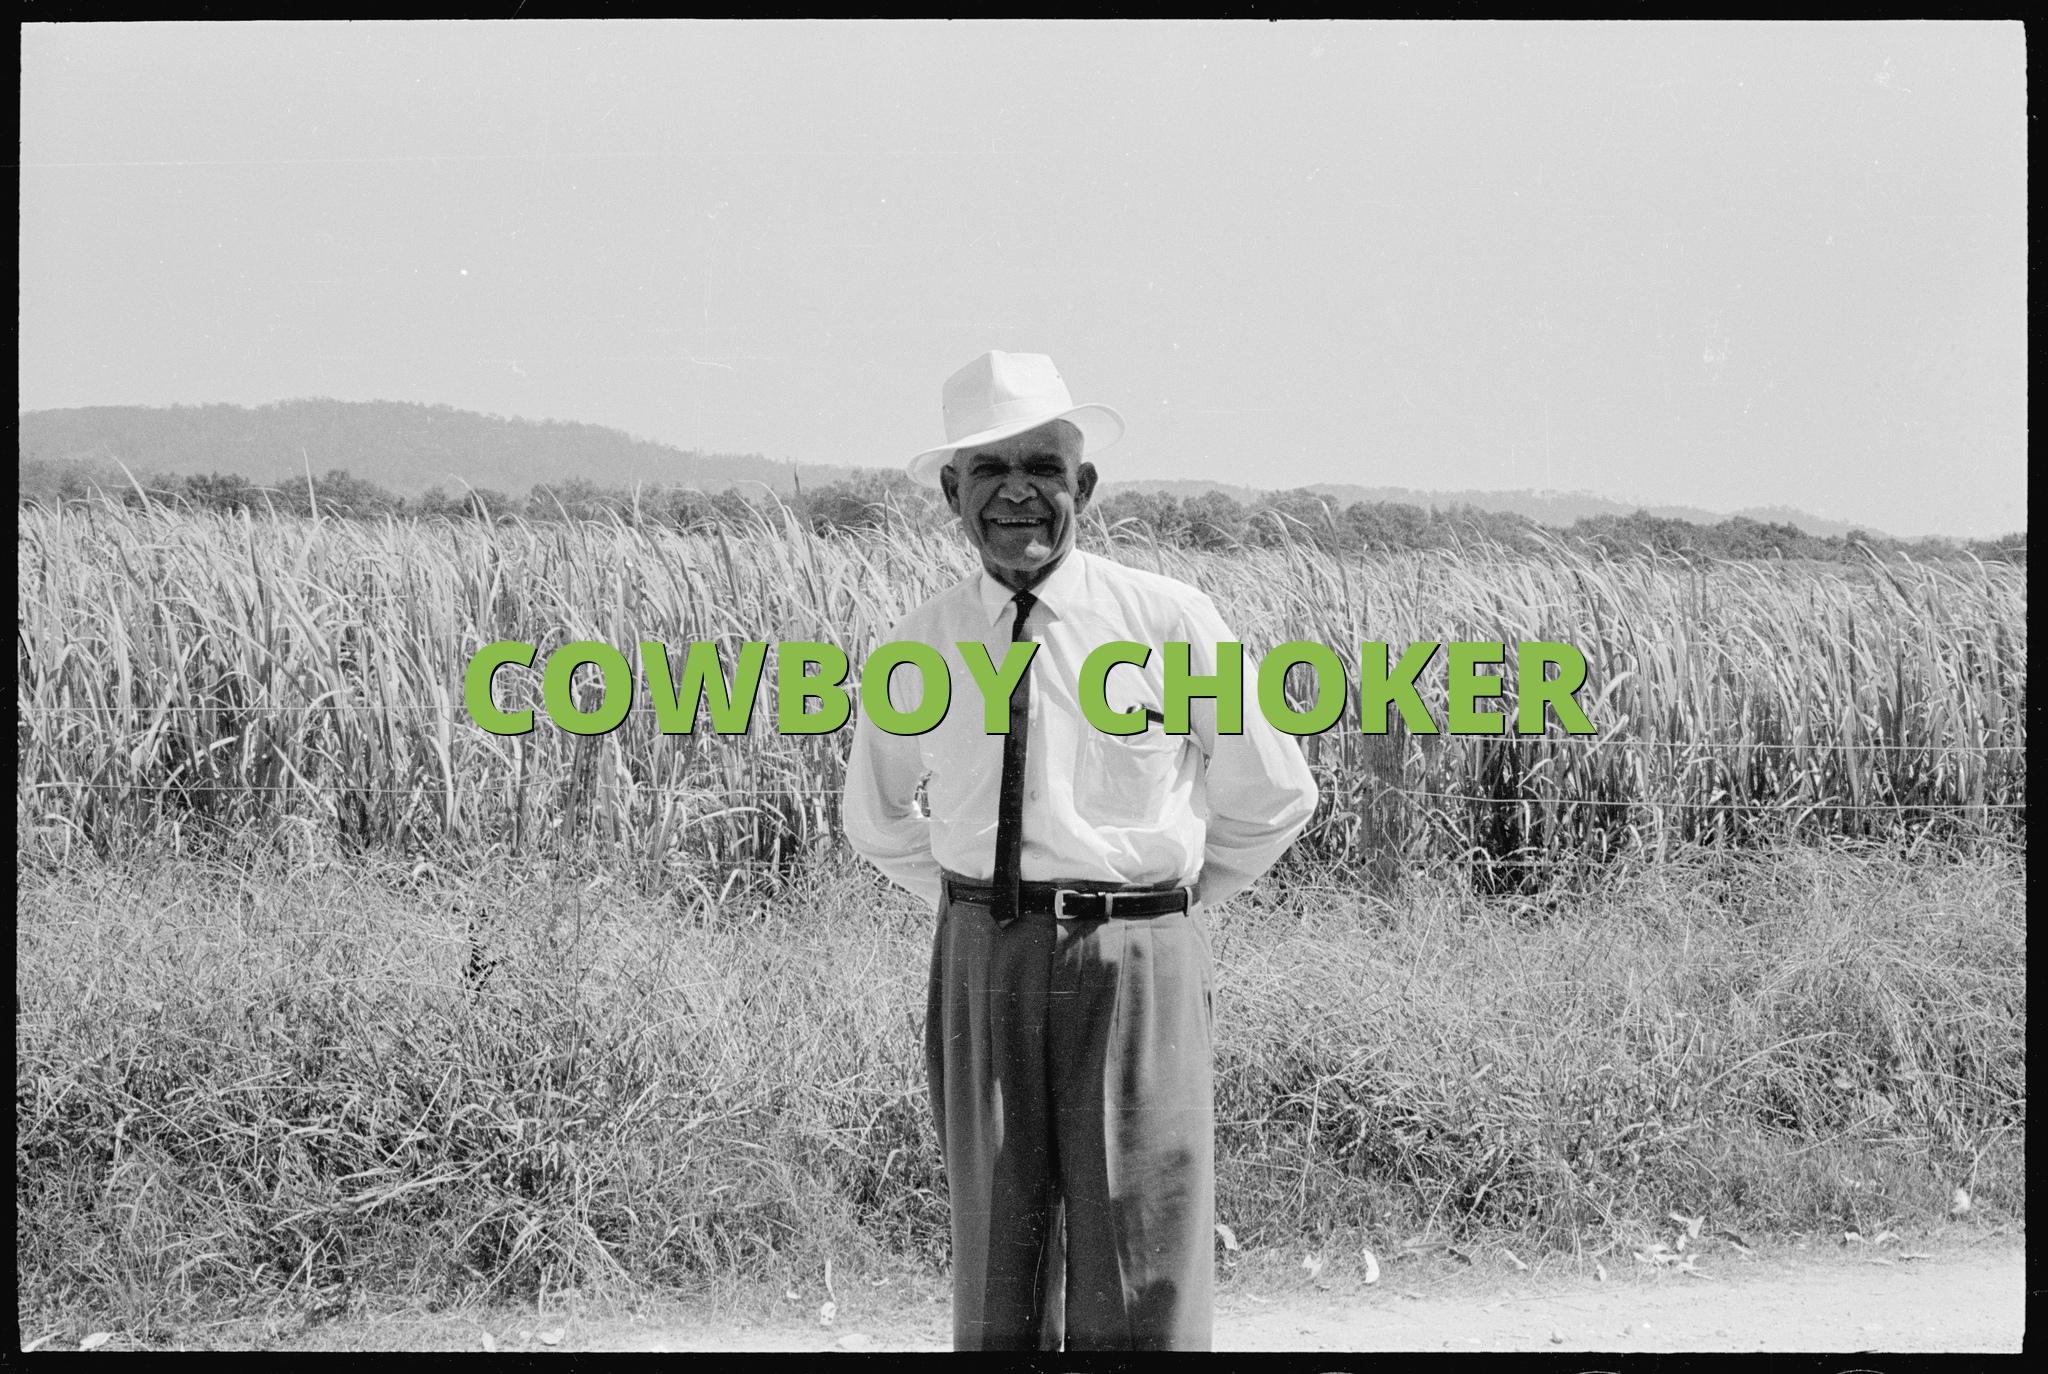 COWBOY CHOKER